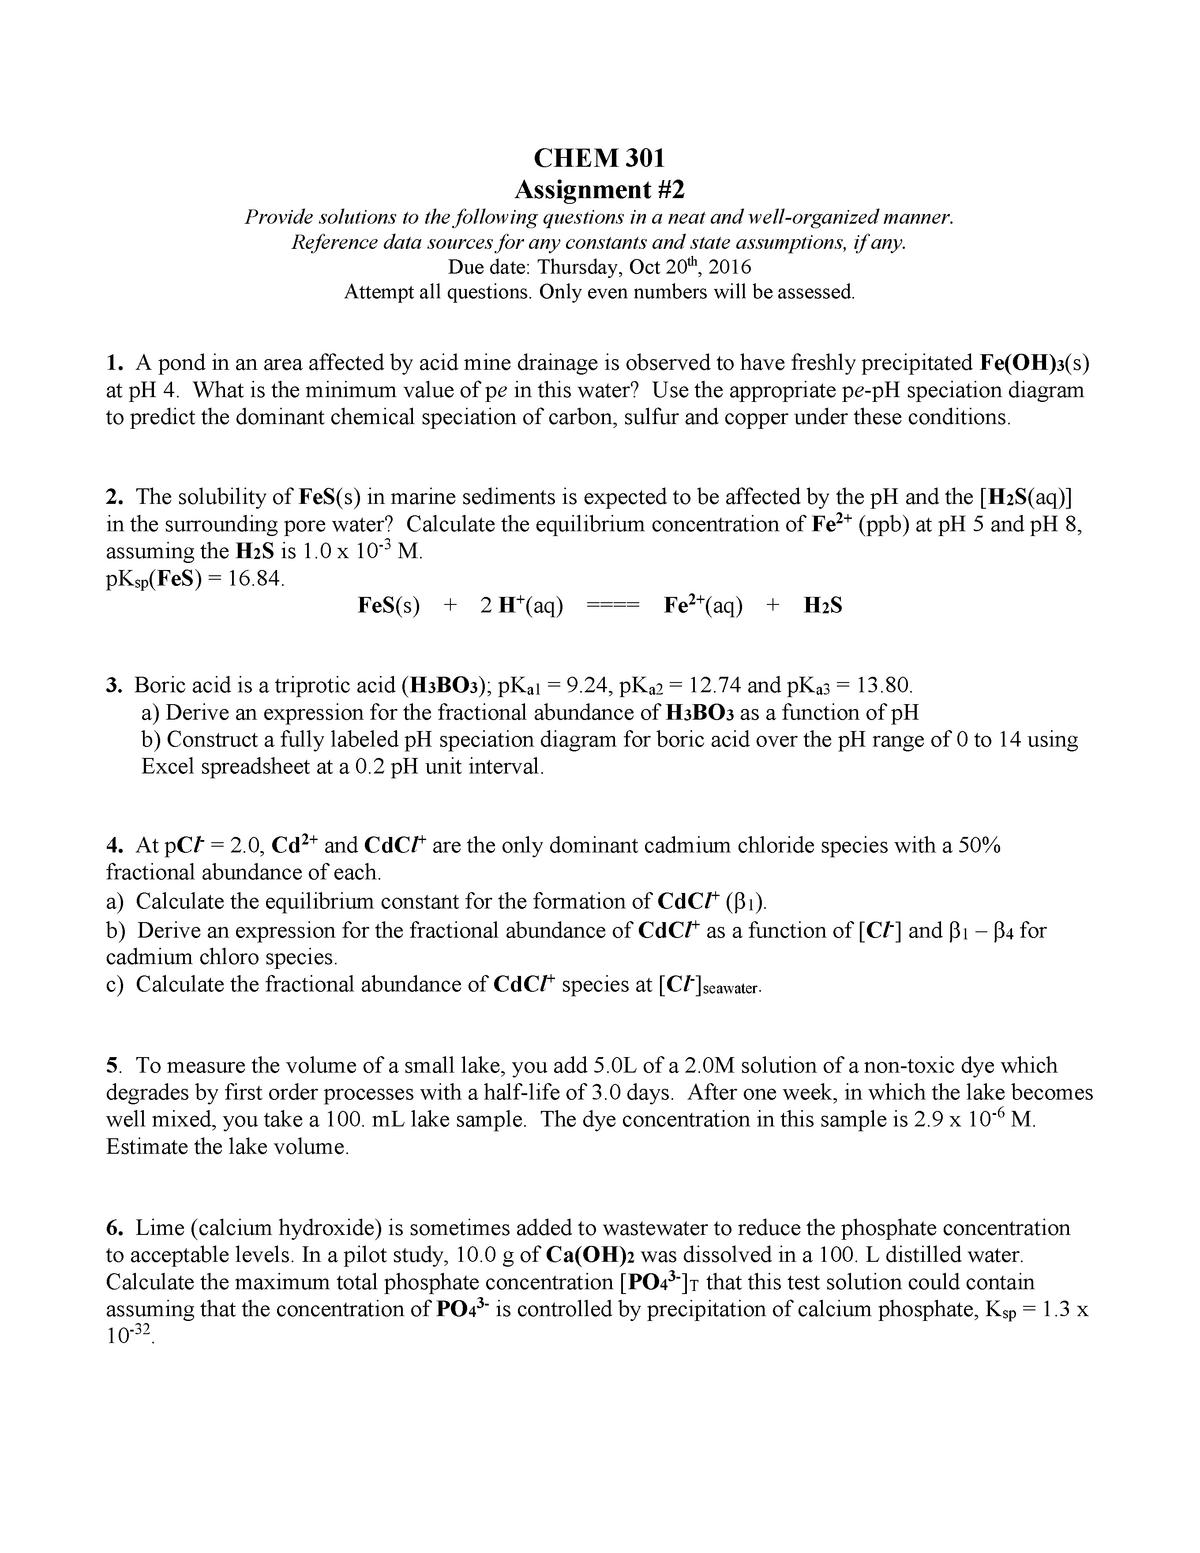 Assign 2 2016 - CHEM301: Aqueous Environmental Chemistry